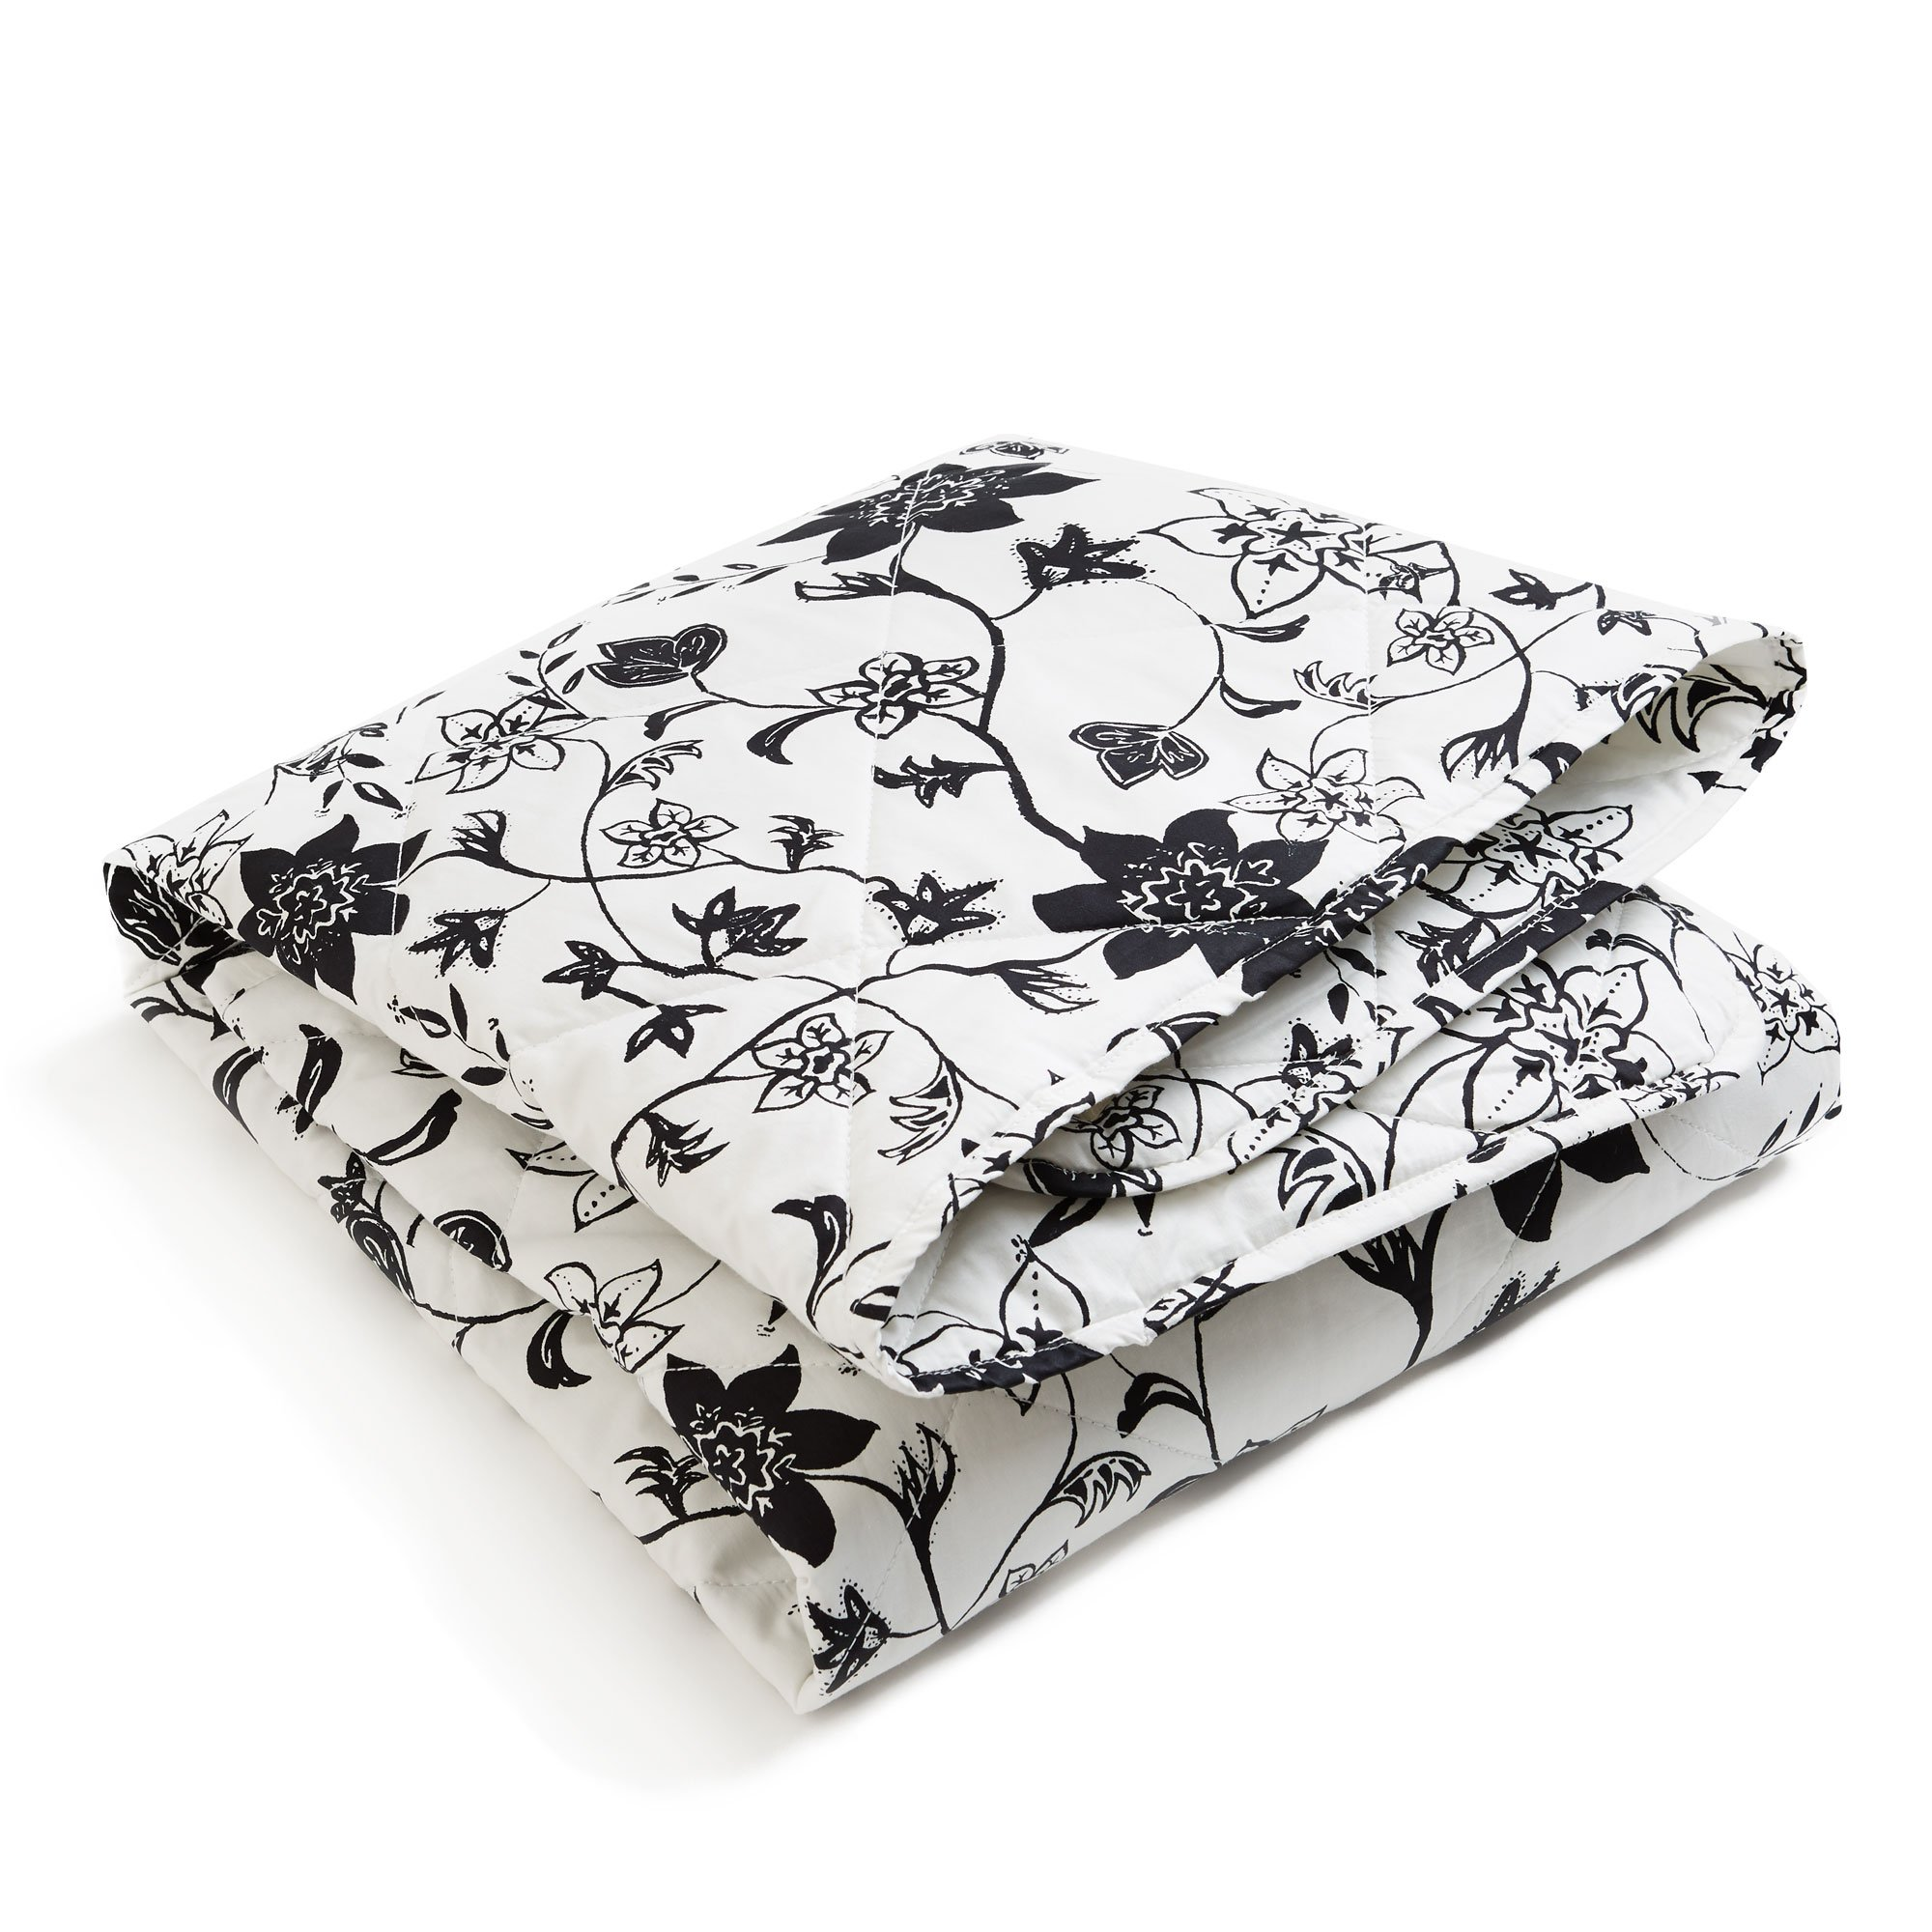 Brooklyn Born Organic Quilt - Modern Floral, Black/White, One Size